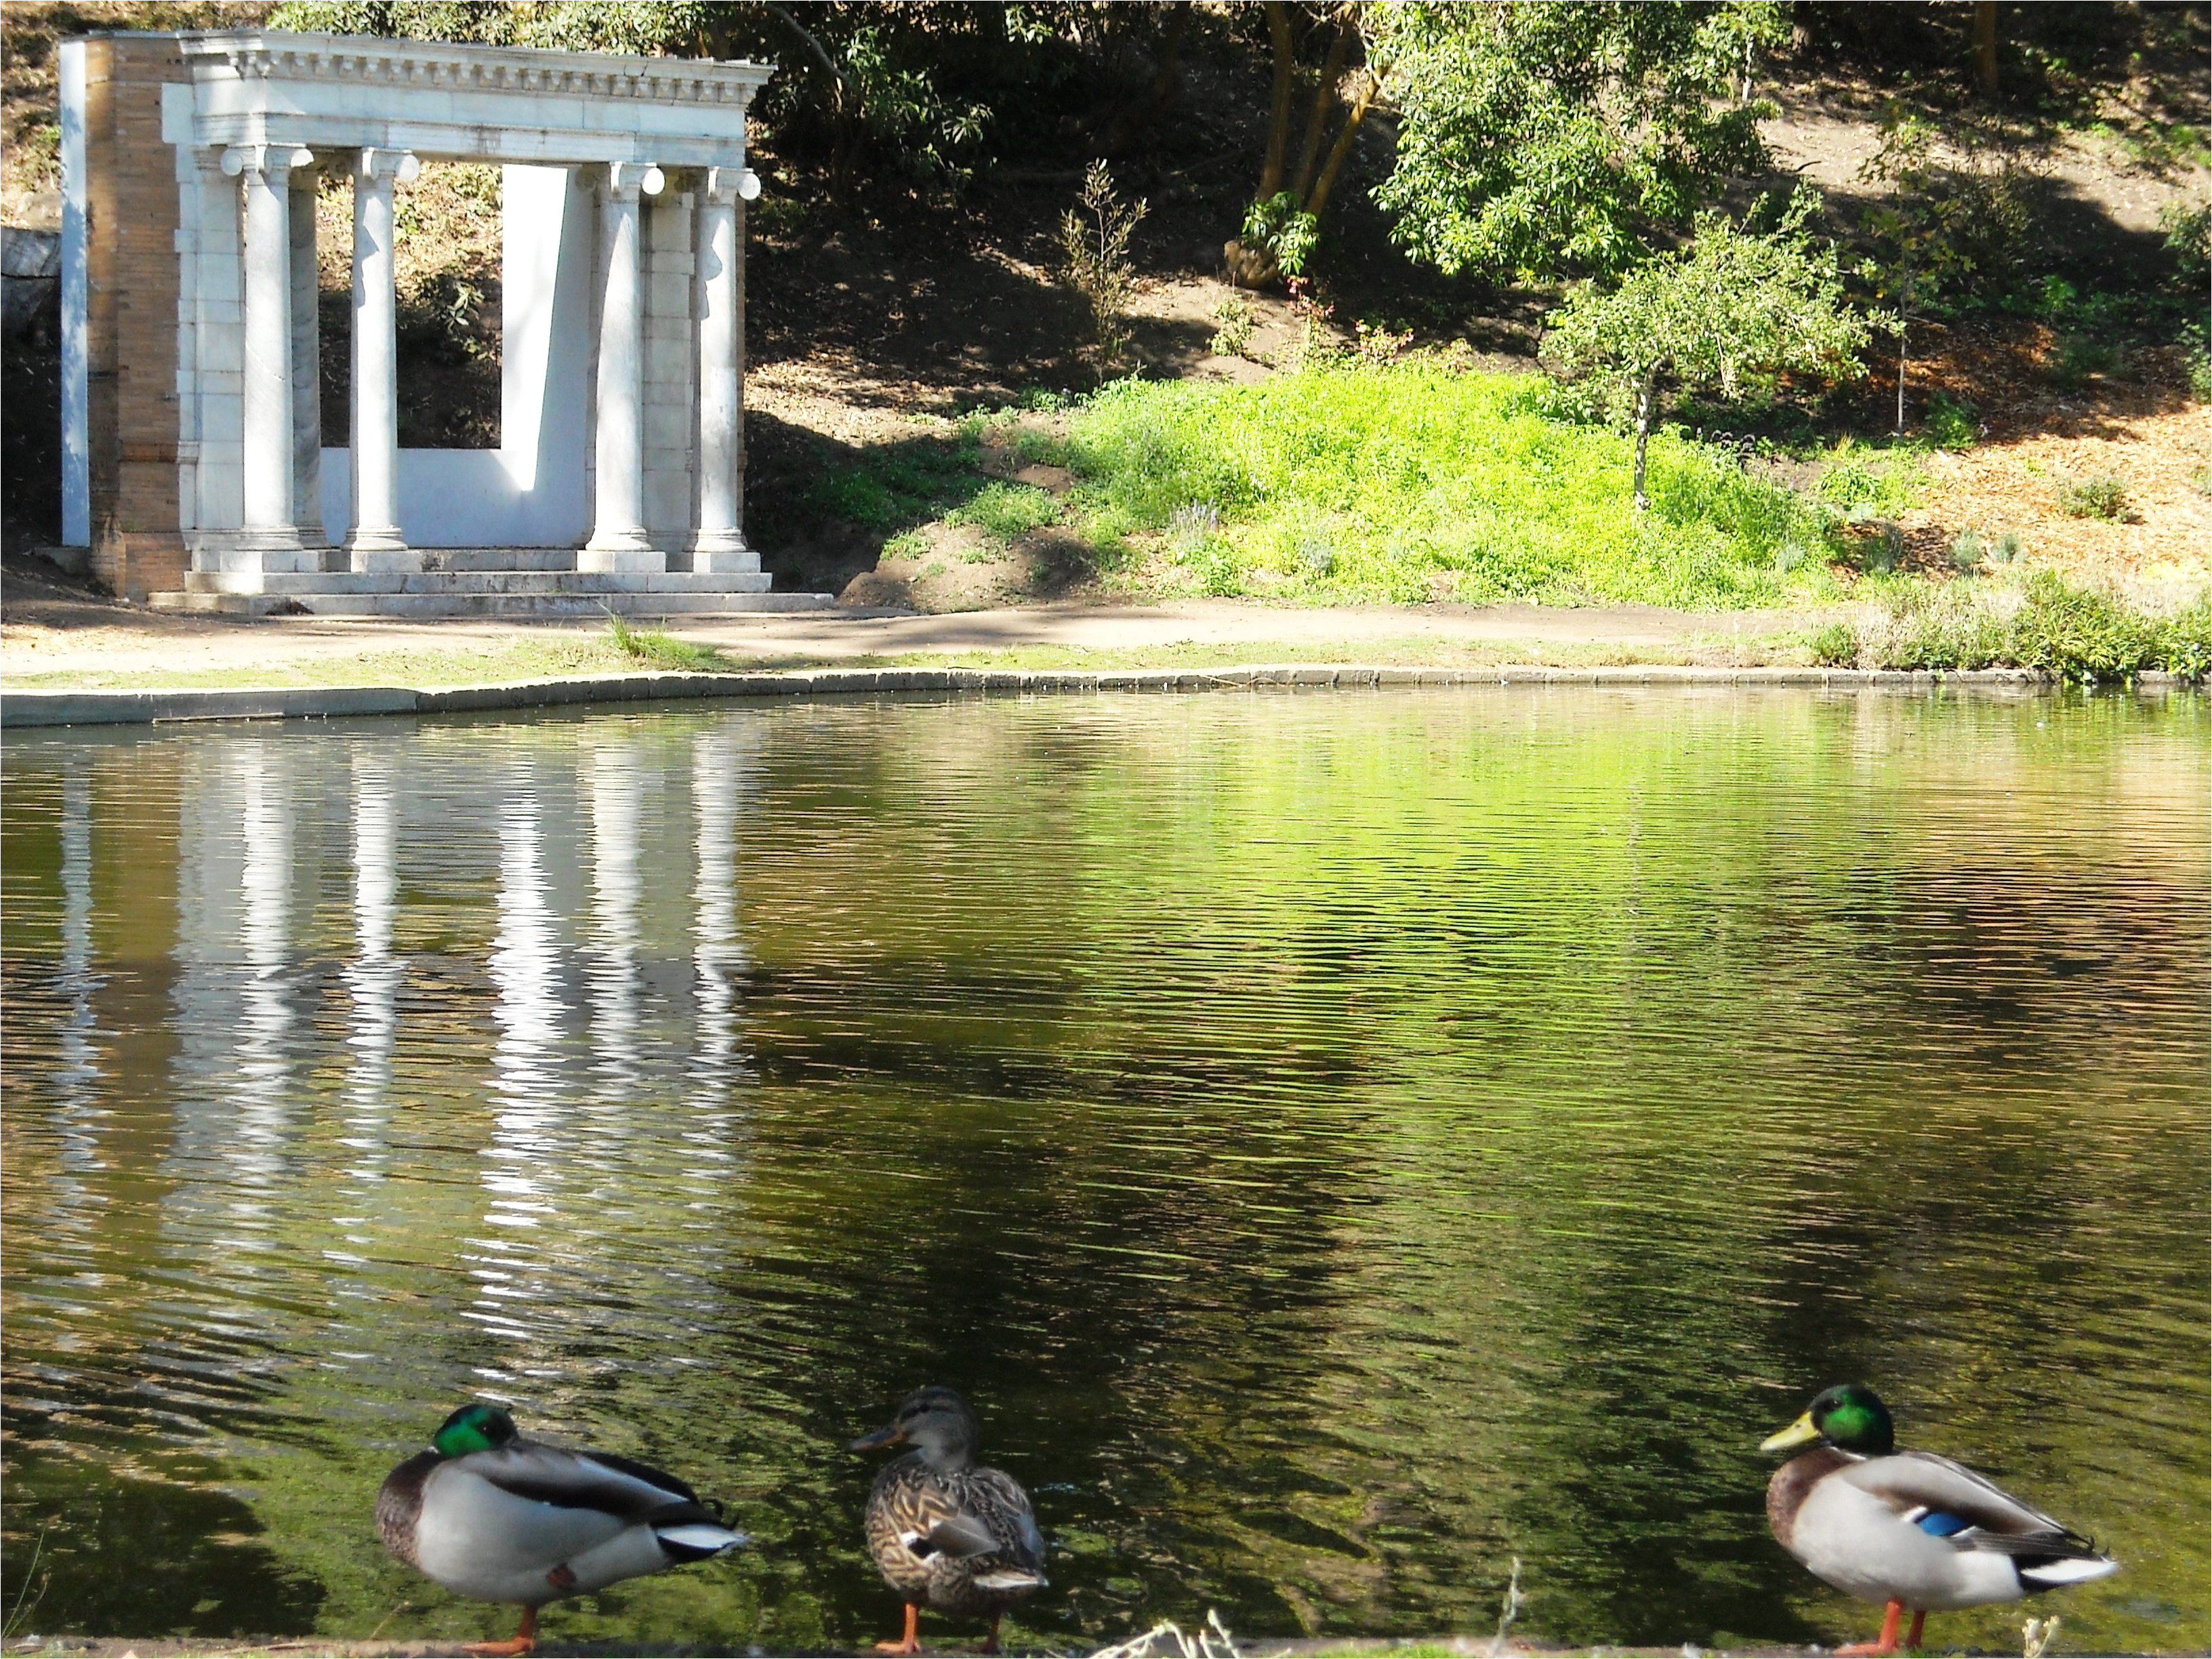 golden gate park 2c san francisco 2c ca jpg